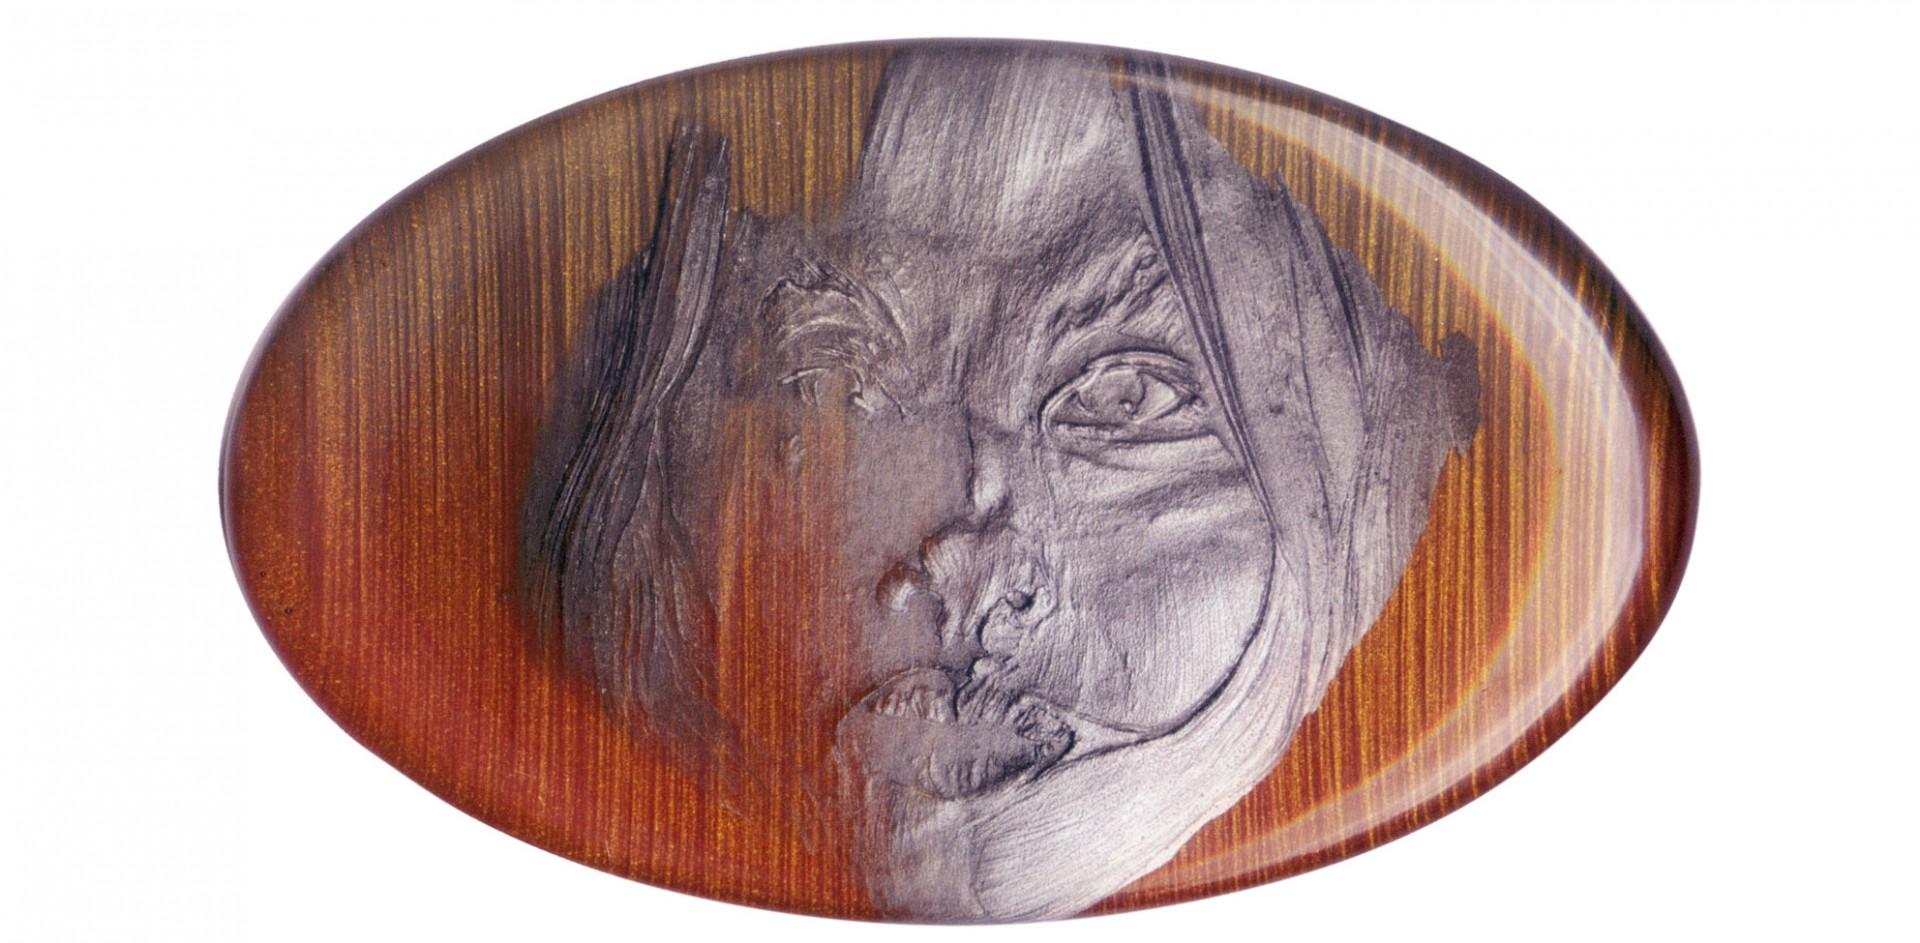 Lily le rosso oro 2004 - cm 25x15 - acrylic, epoxy glazing